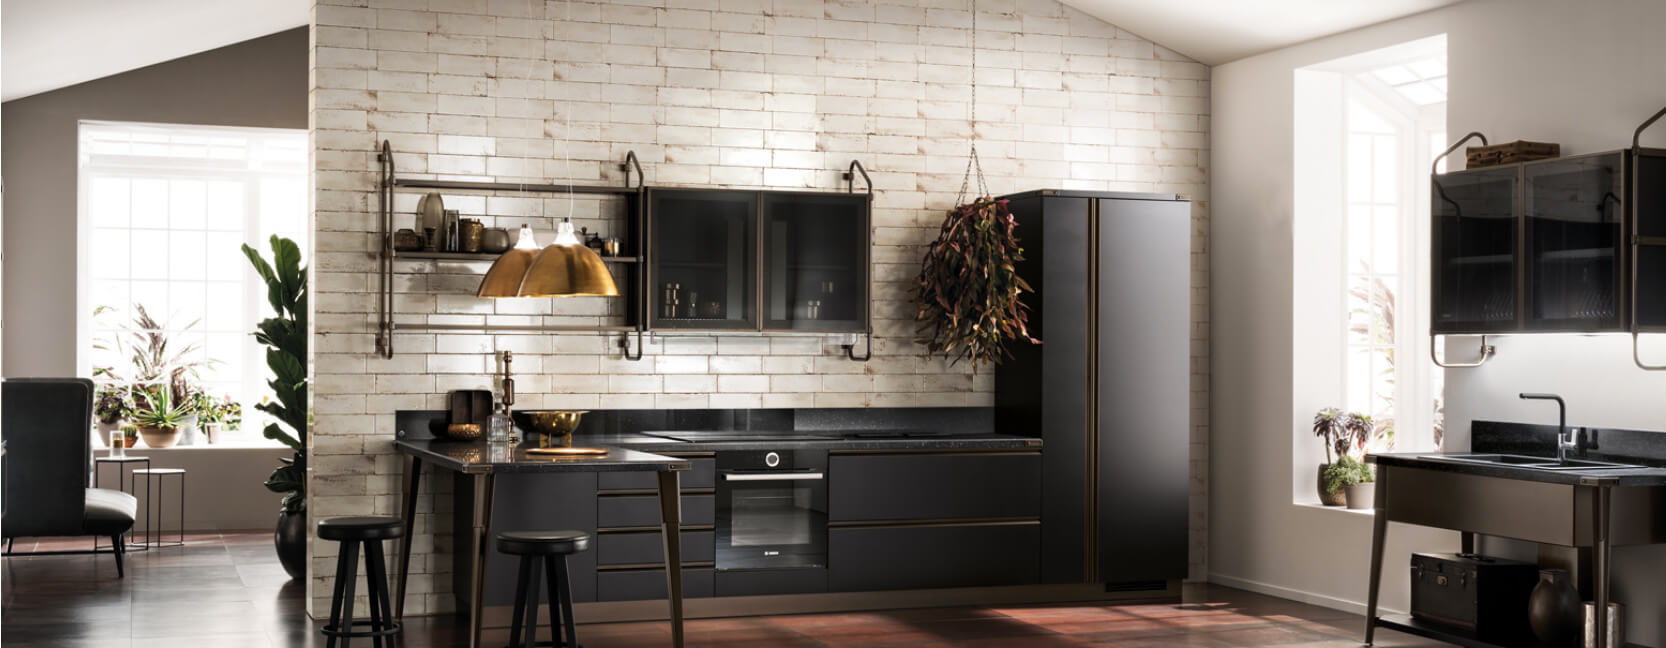 Vitaitaliana luxury Italian kitchen by Scavolini - Showroom Ireland